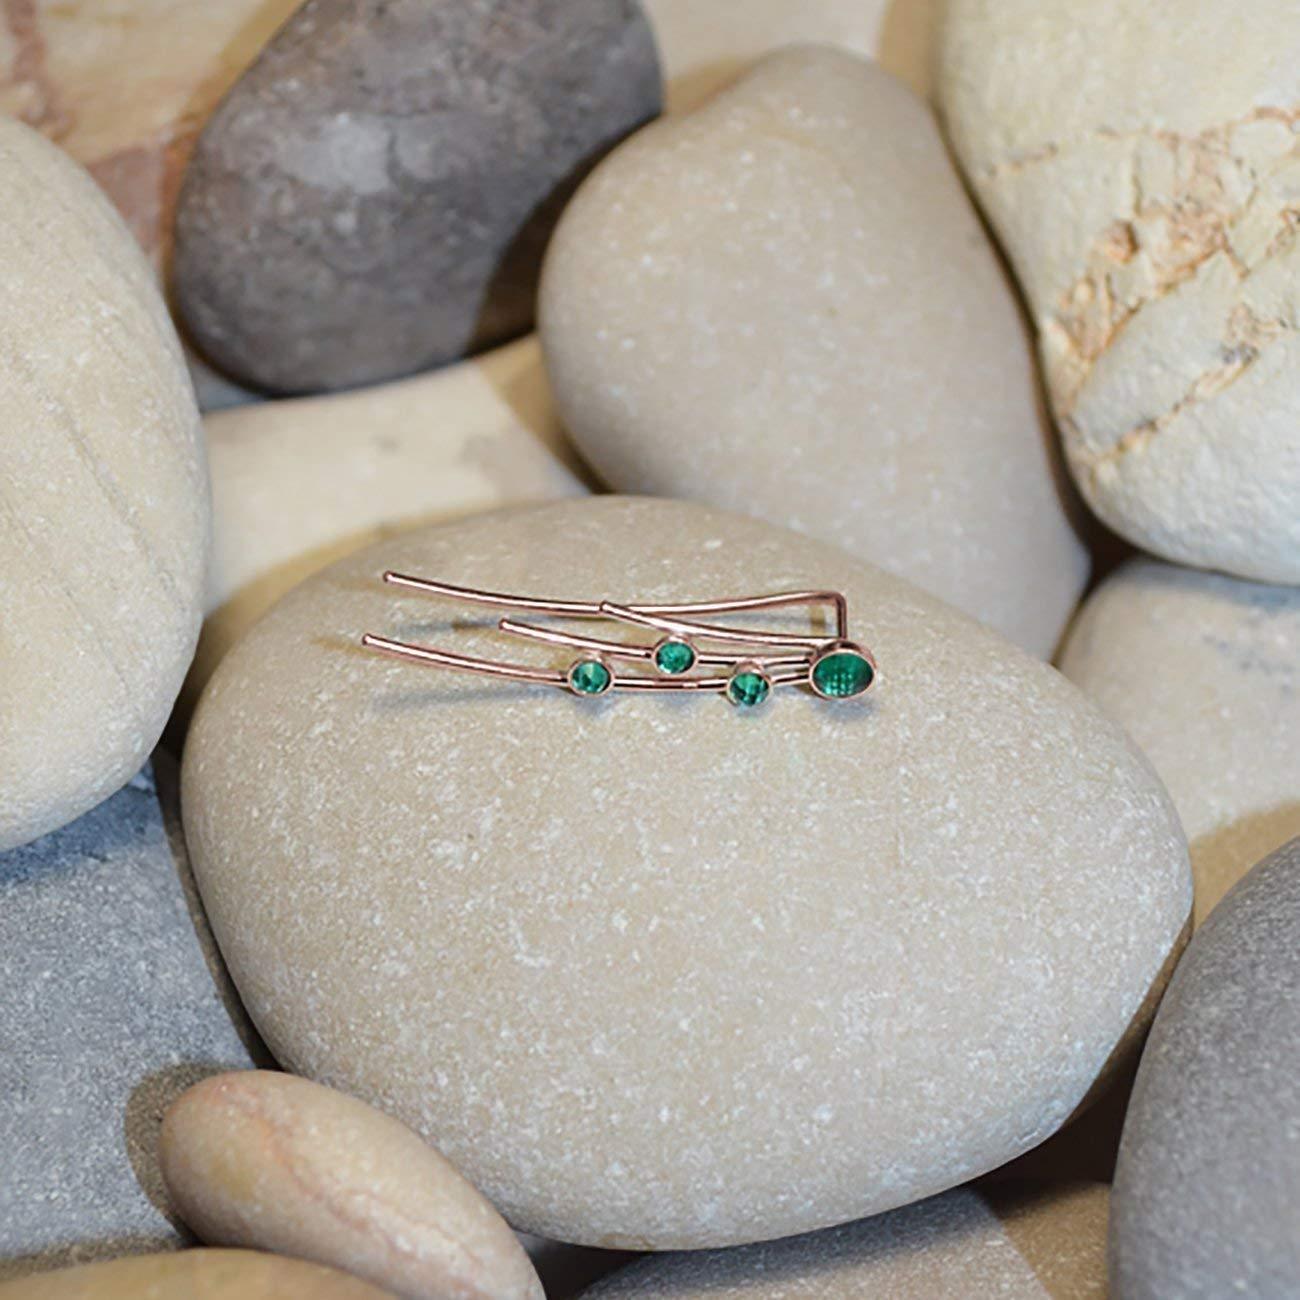 61713992b Amazon.com: Emerald EAR CLIMBER Rose Gold // Emerald Bar Stud - Minimalist  Earring - Emerald Ear Cuff - Post Earrings - Ear Sweep - Earcuff: Handmade